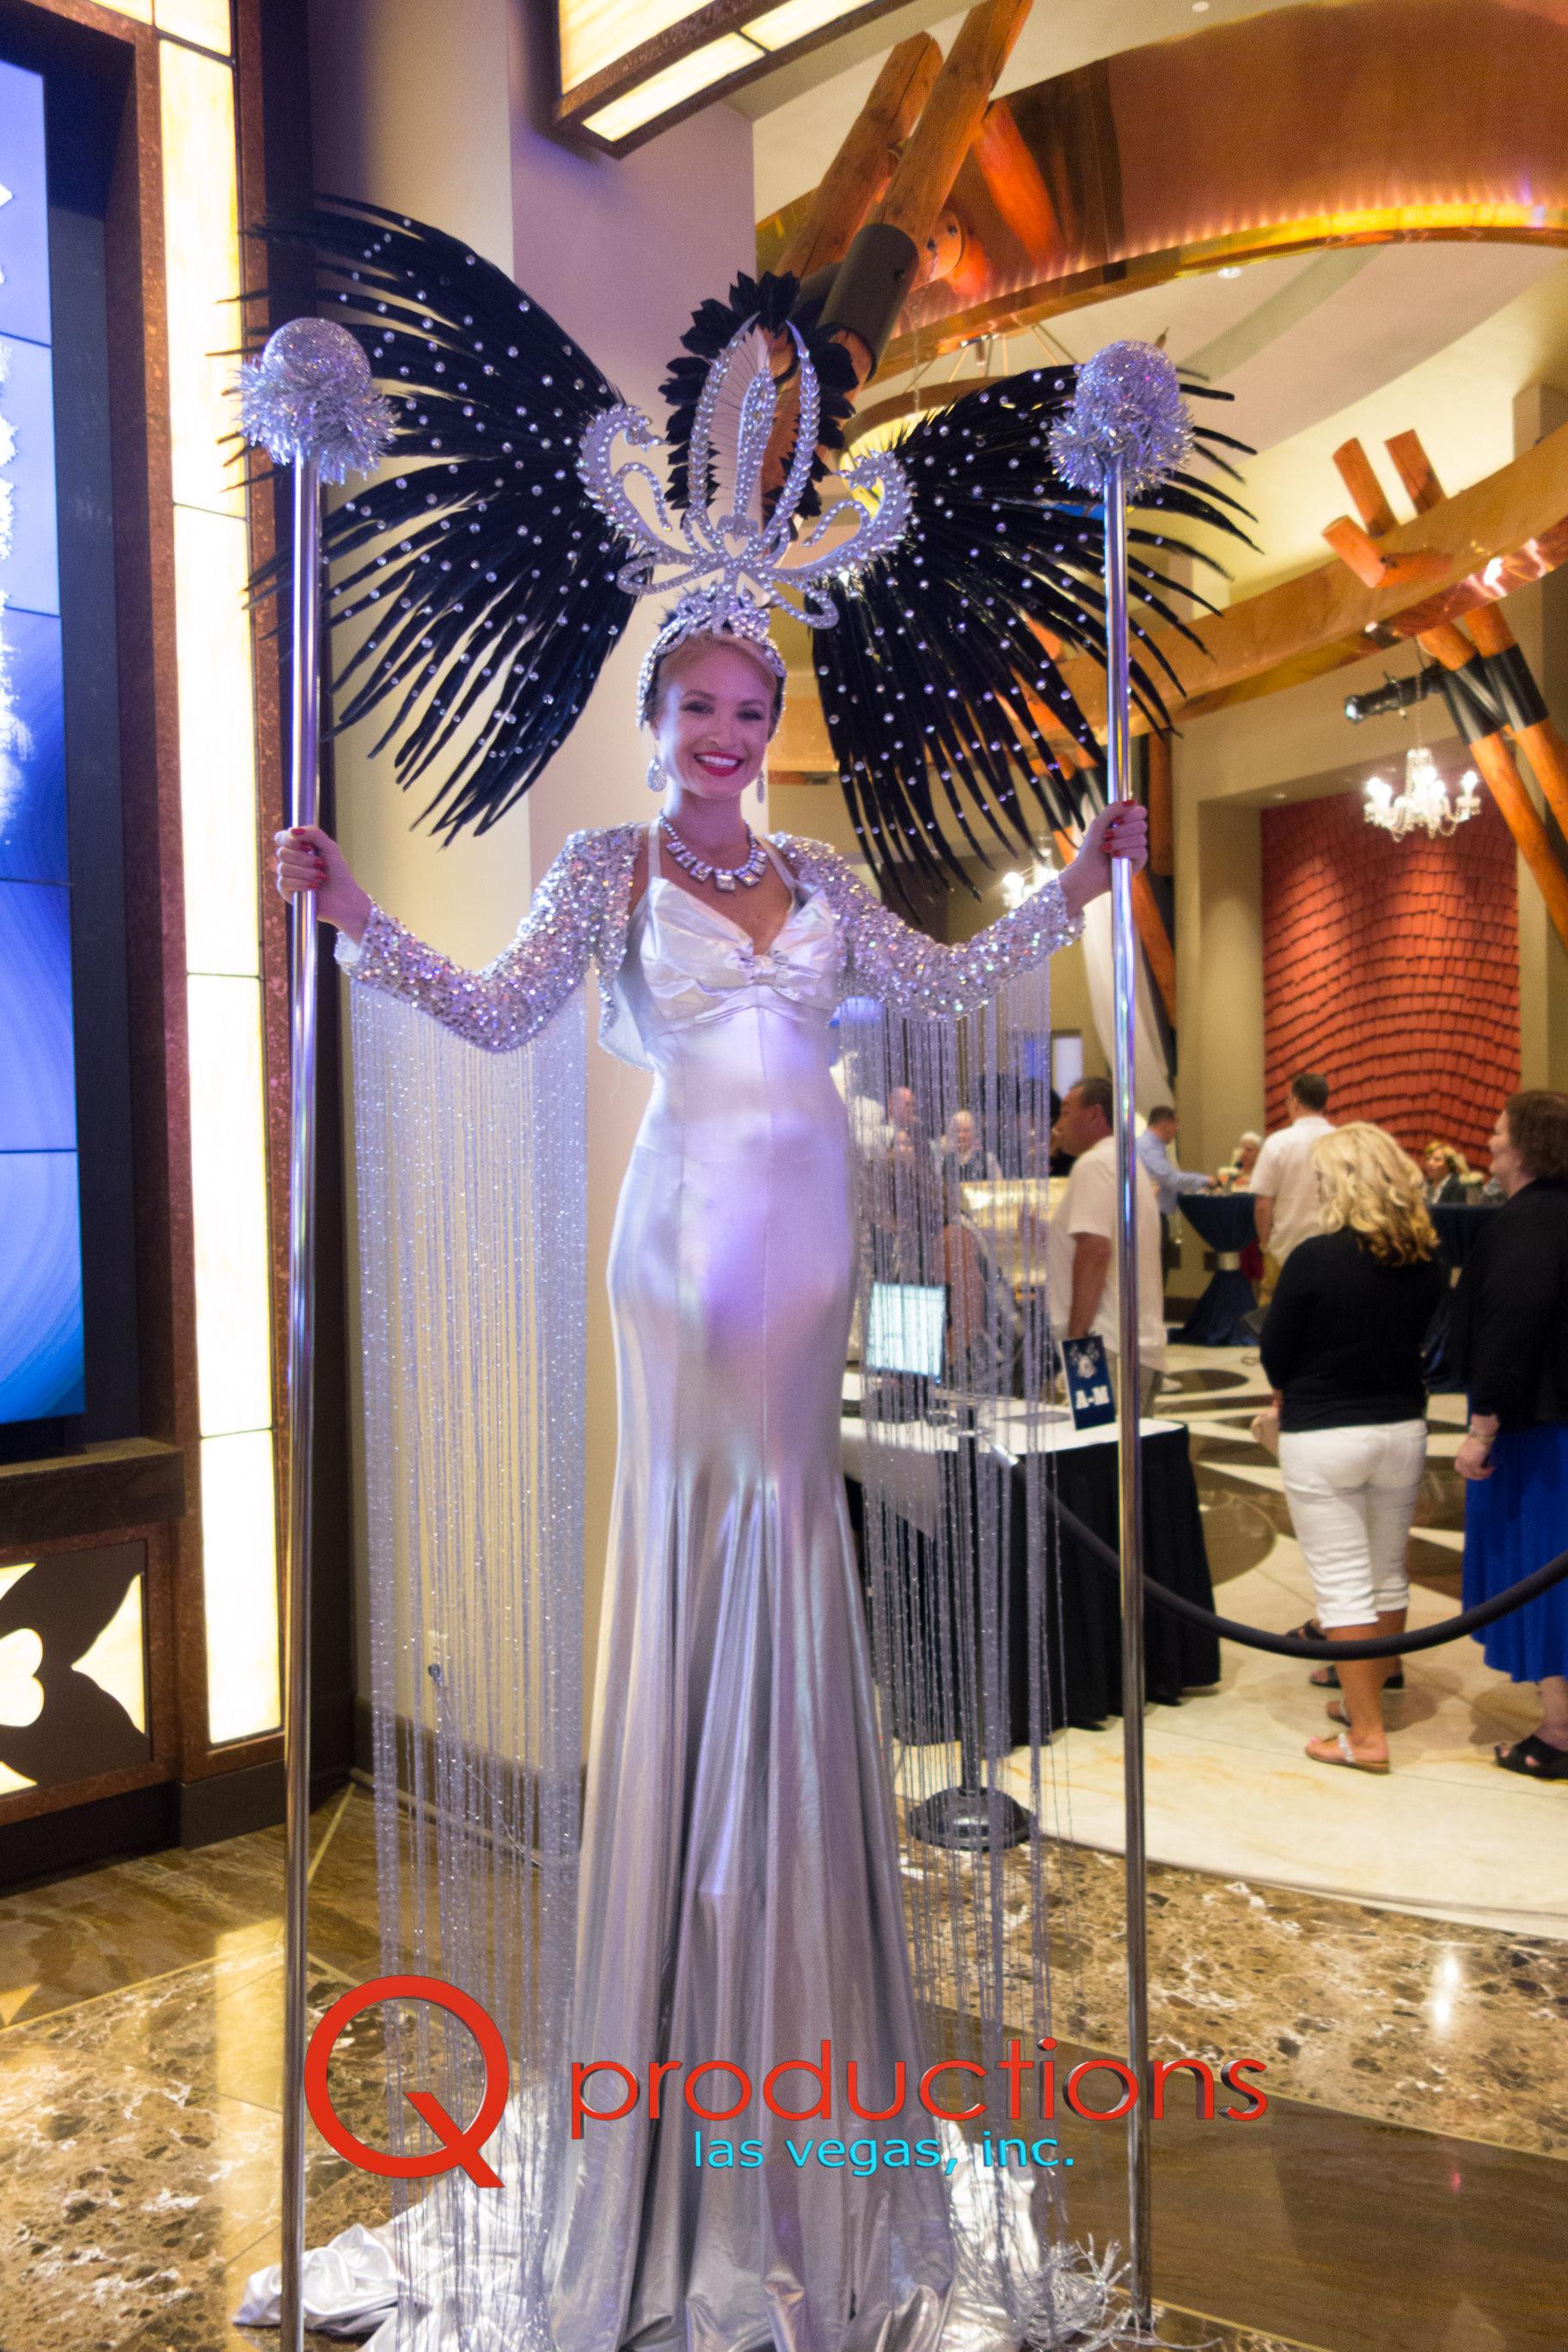 Silver Towering Showgirl Glamazon